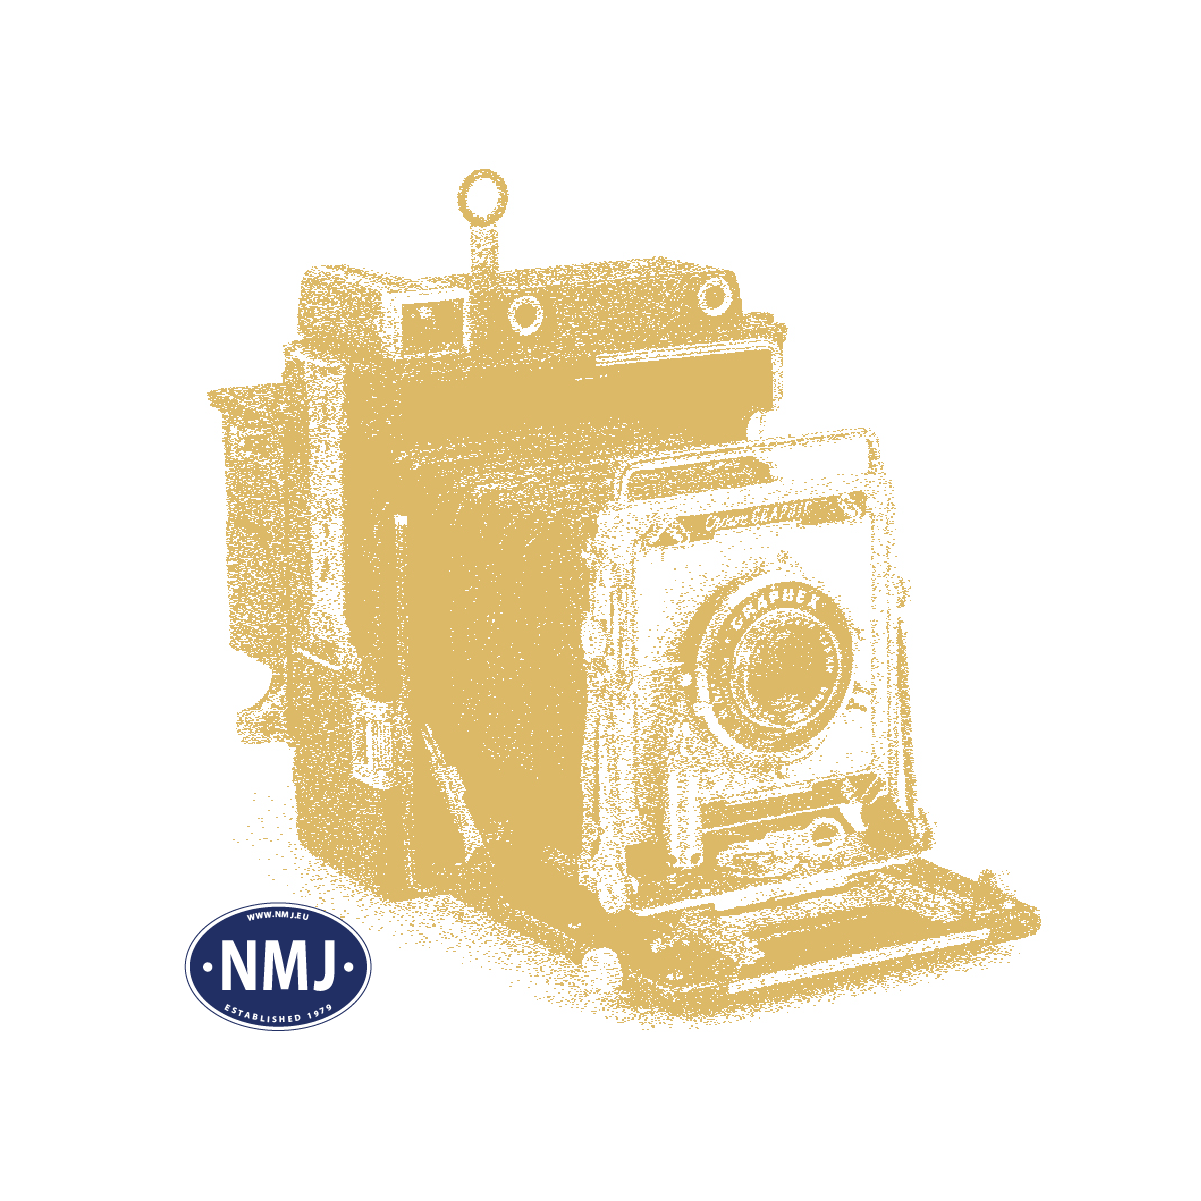 NMJT131.102 - NMJ Topline NSB B3-2 25502 type 3, Gammeldesign